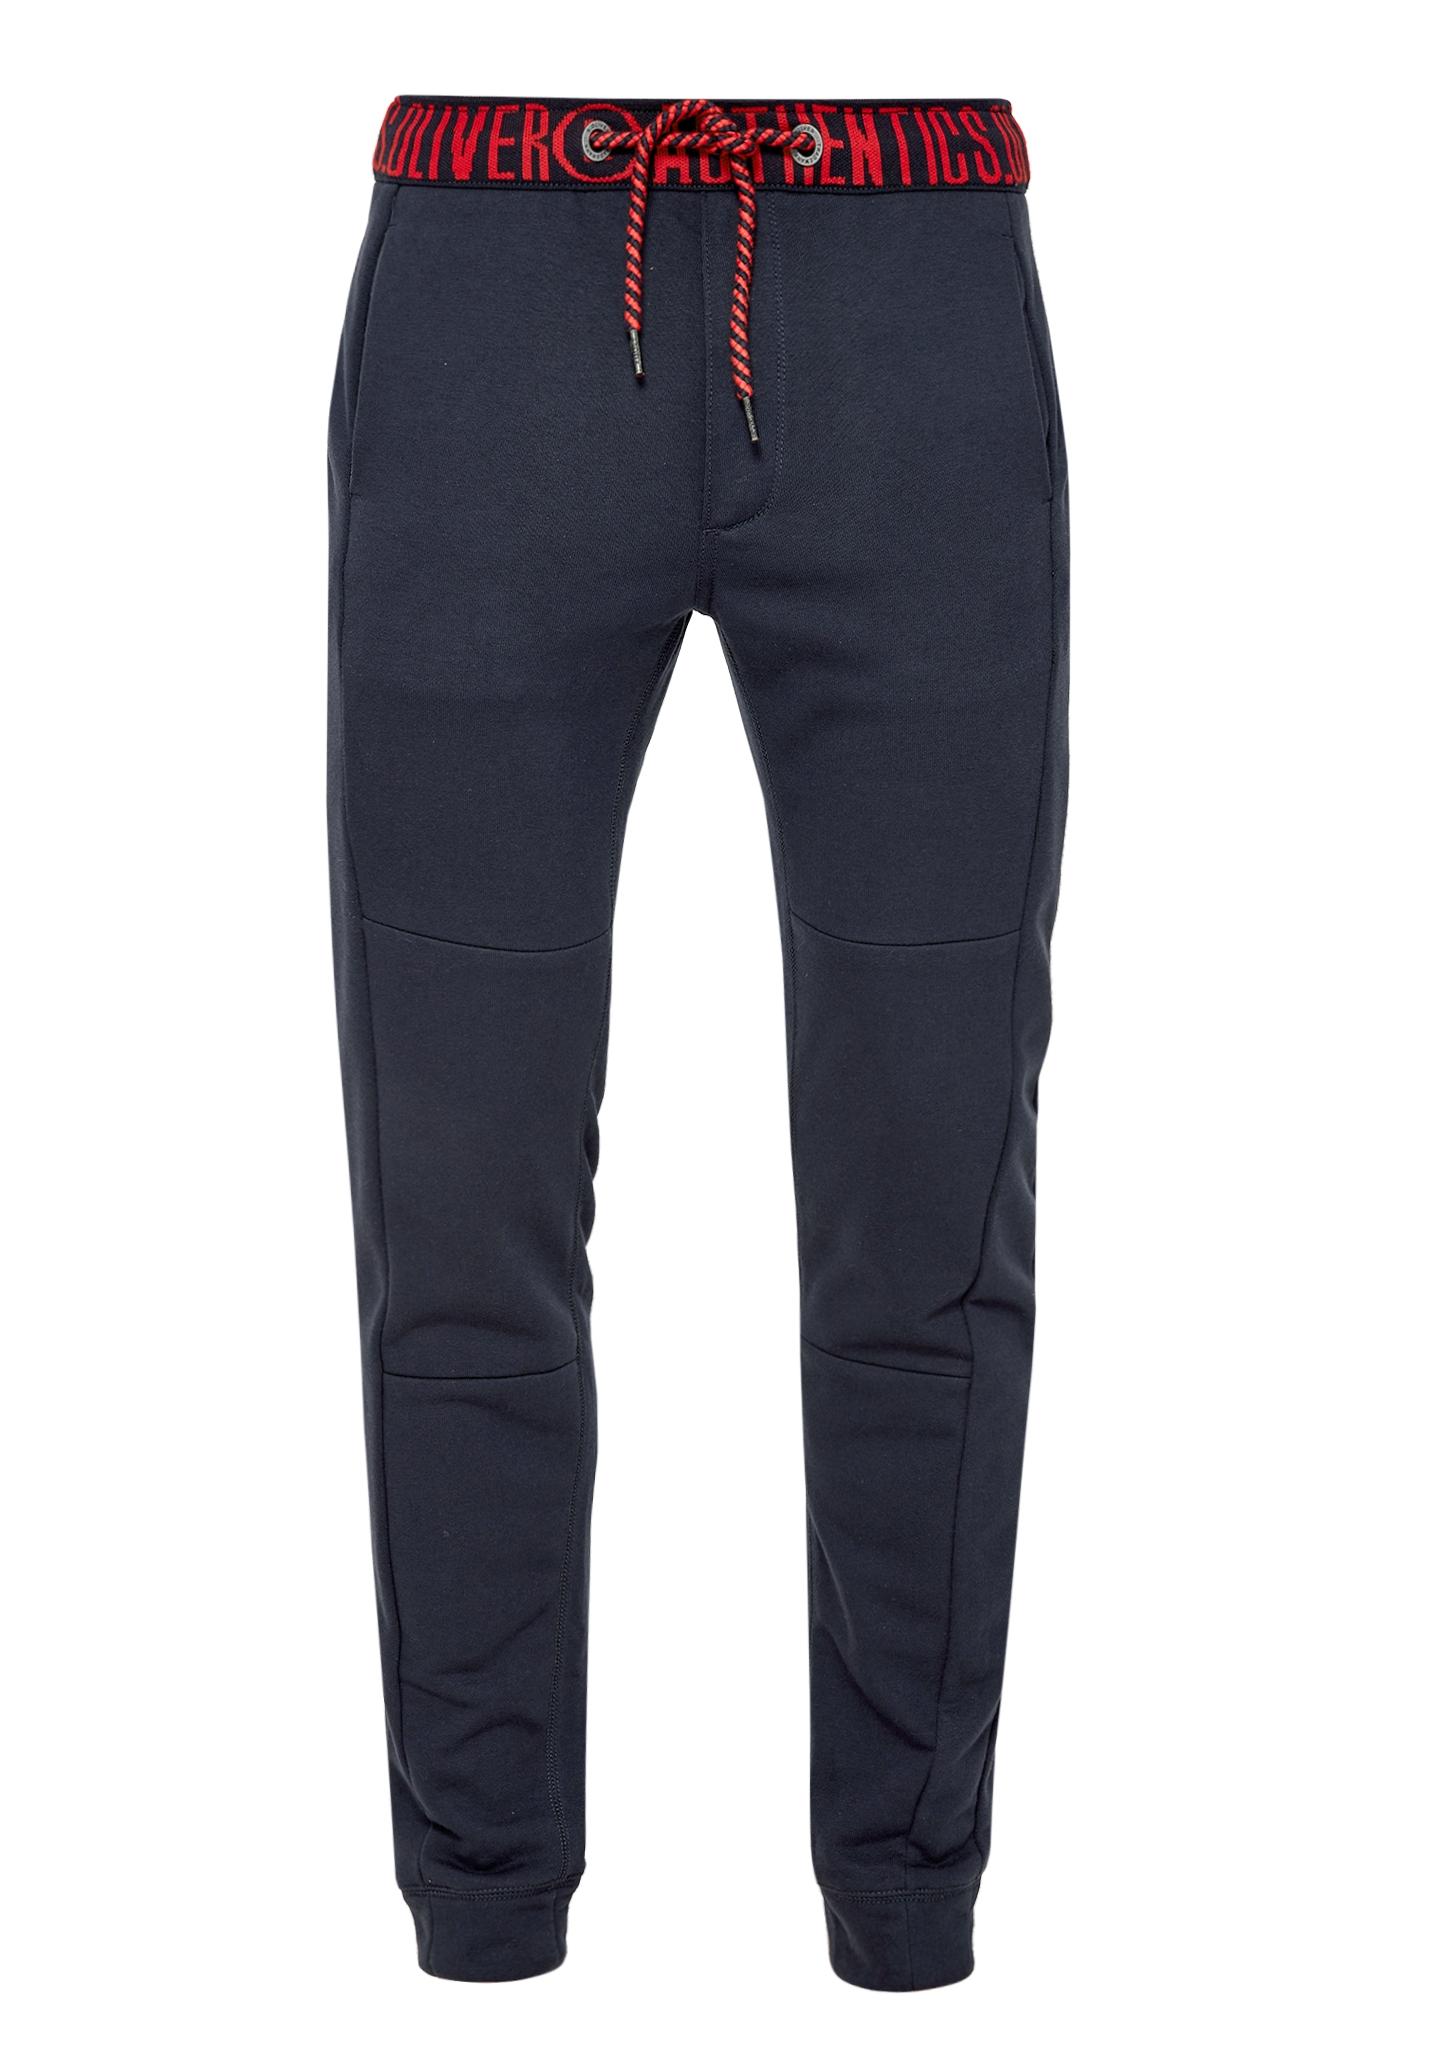 Sweatpants   Bekleidung > Hosen > Sweathosen   Blau   80% baumwolle -  20% polyester   s.Oliver